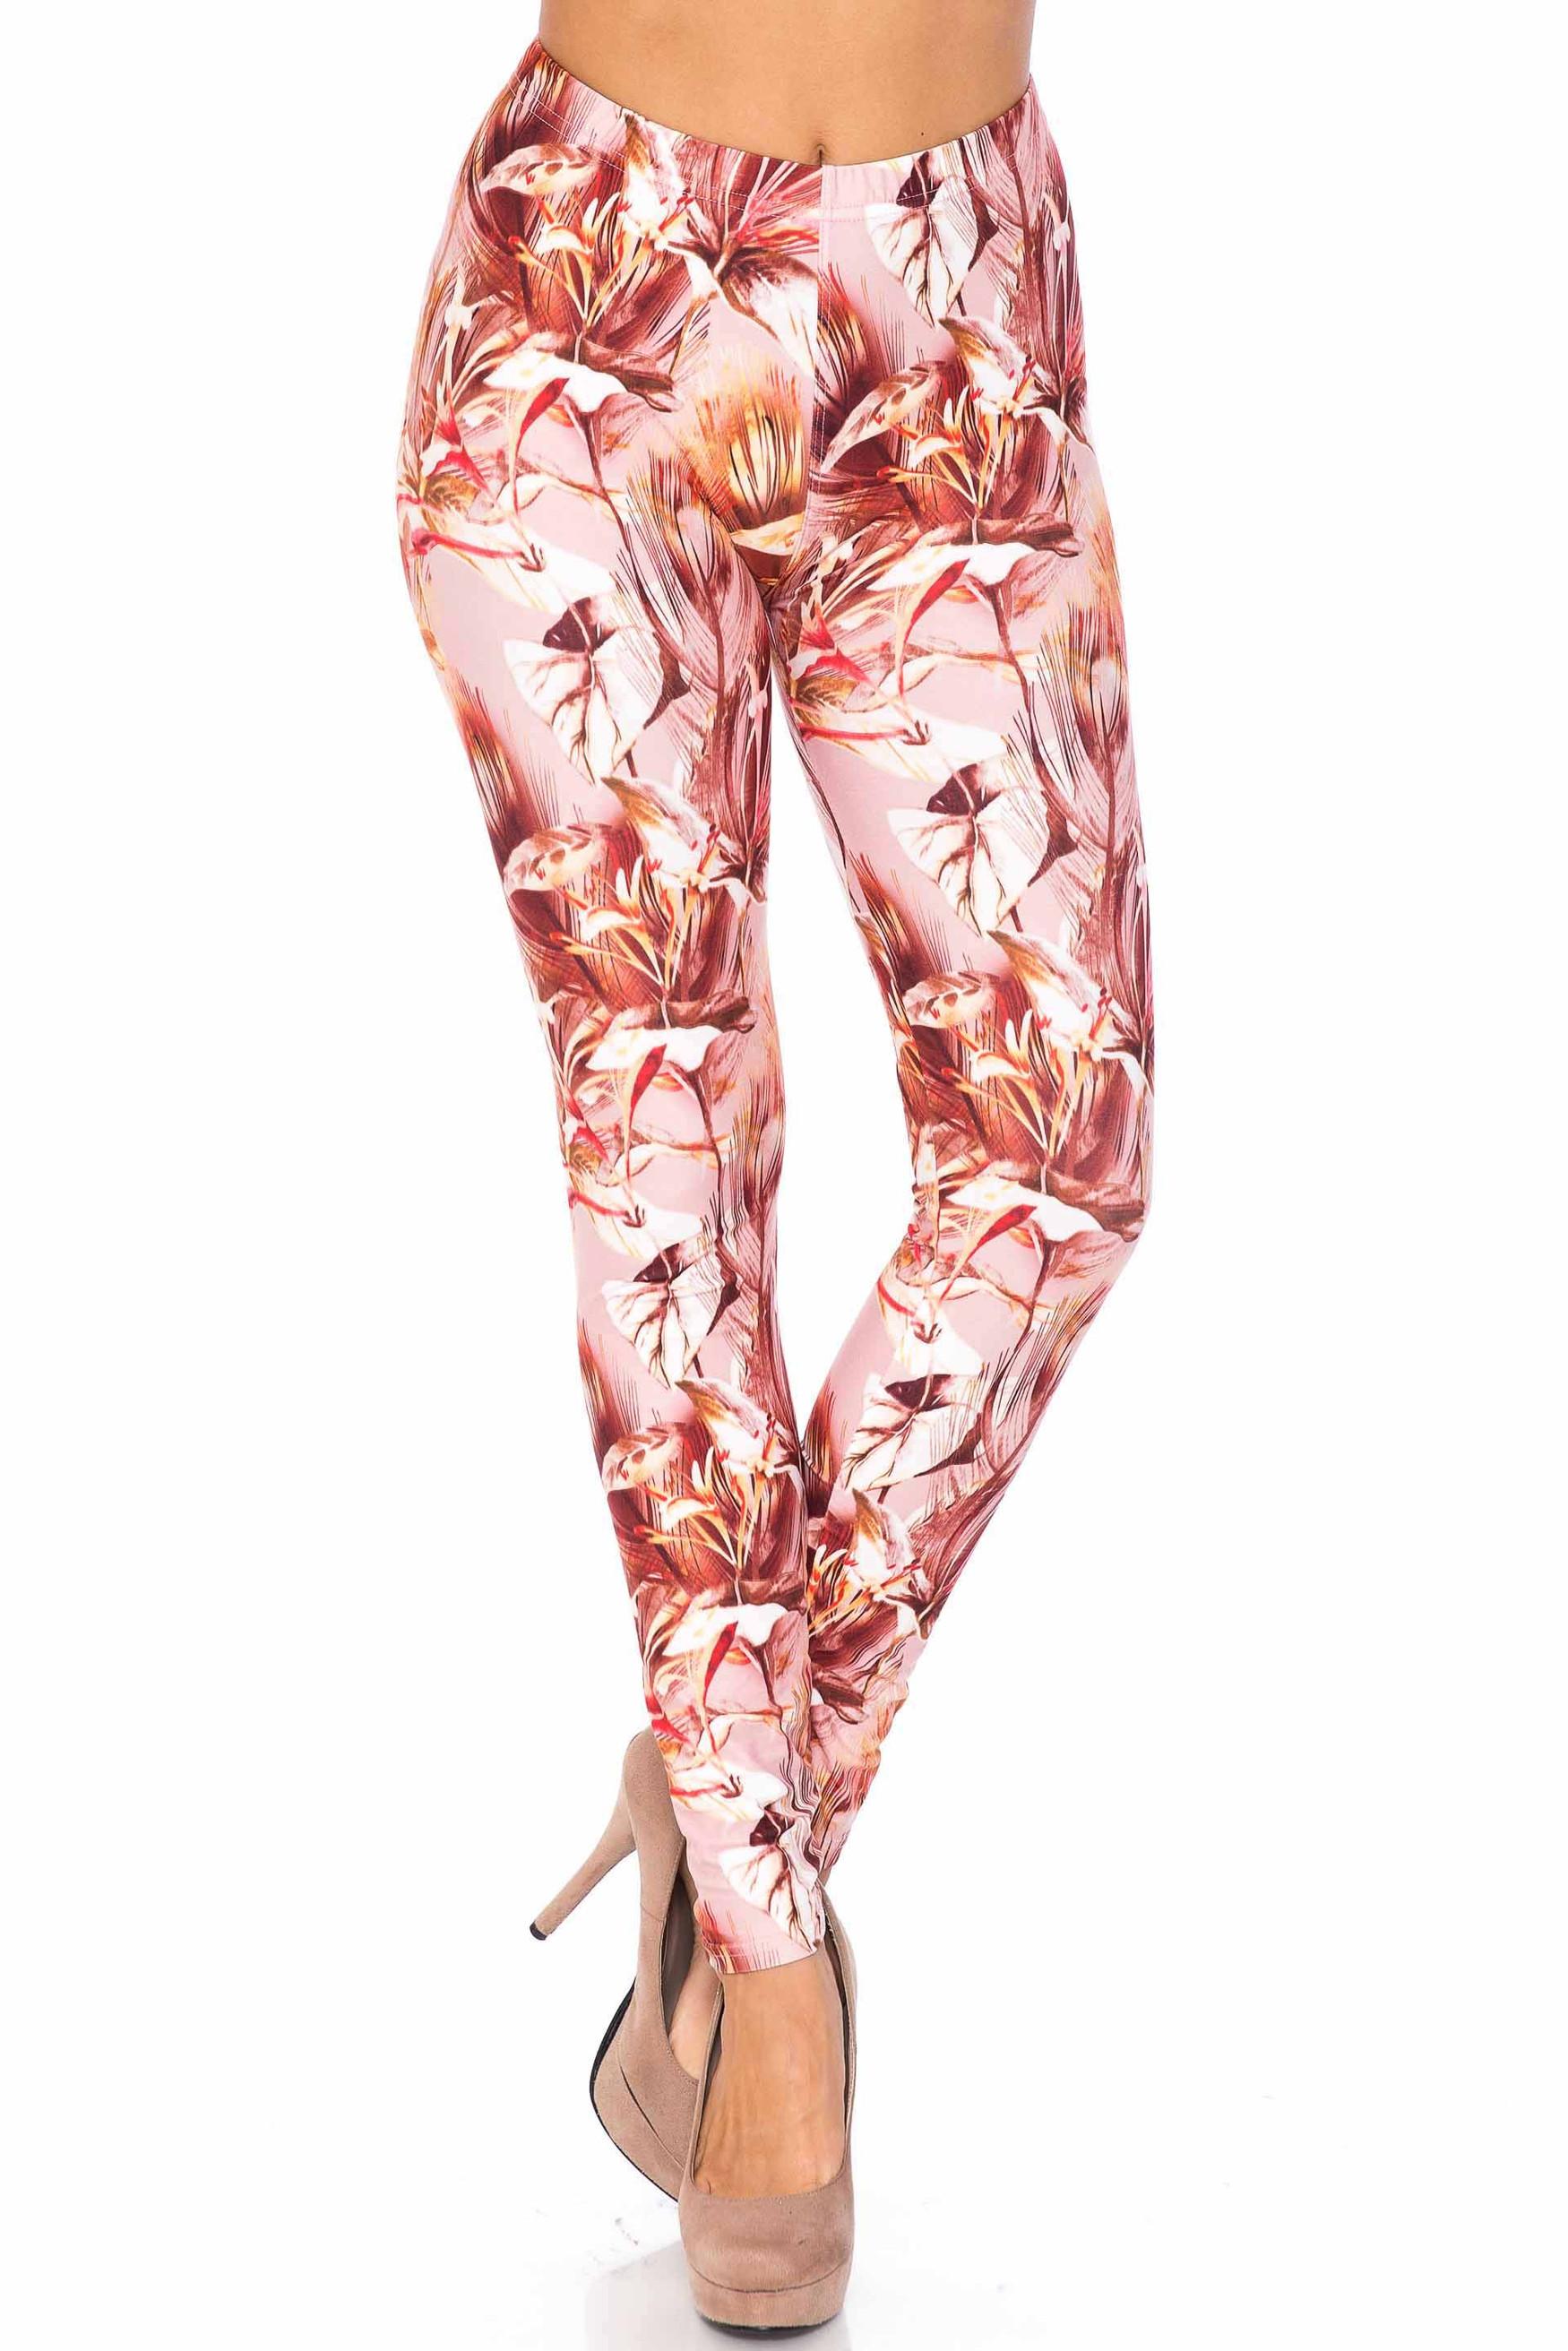 Creamy Soft Mocha Floral Kids Leggings - USA Fashion™